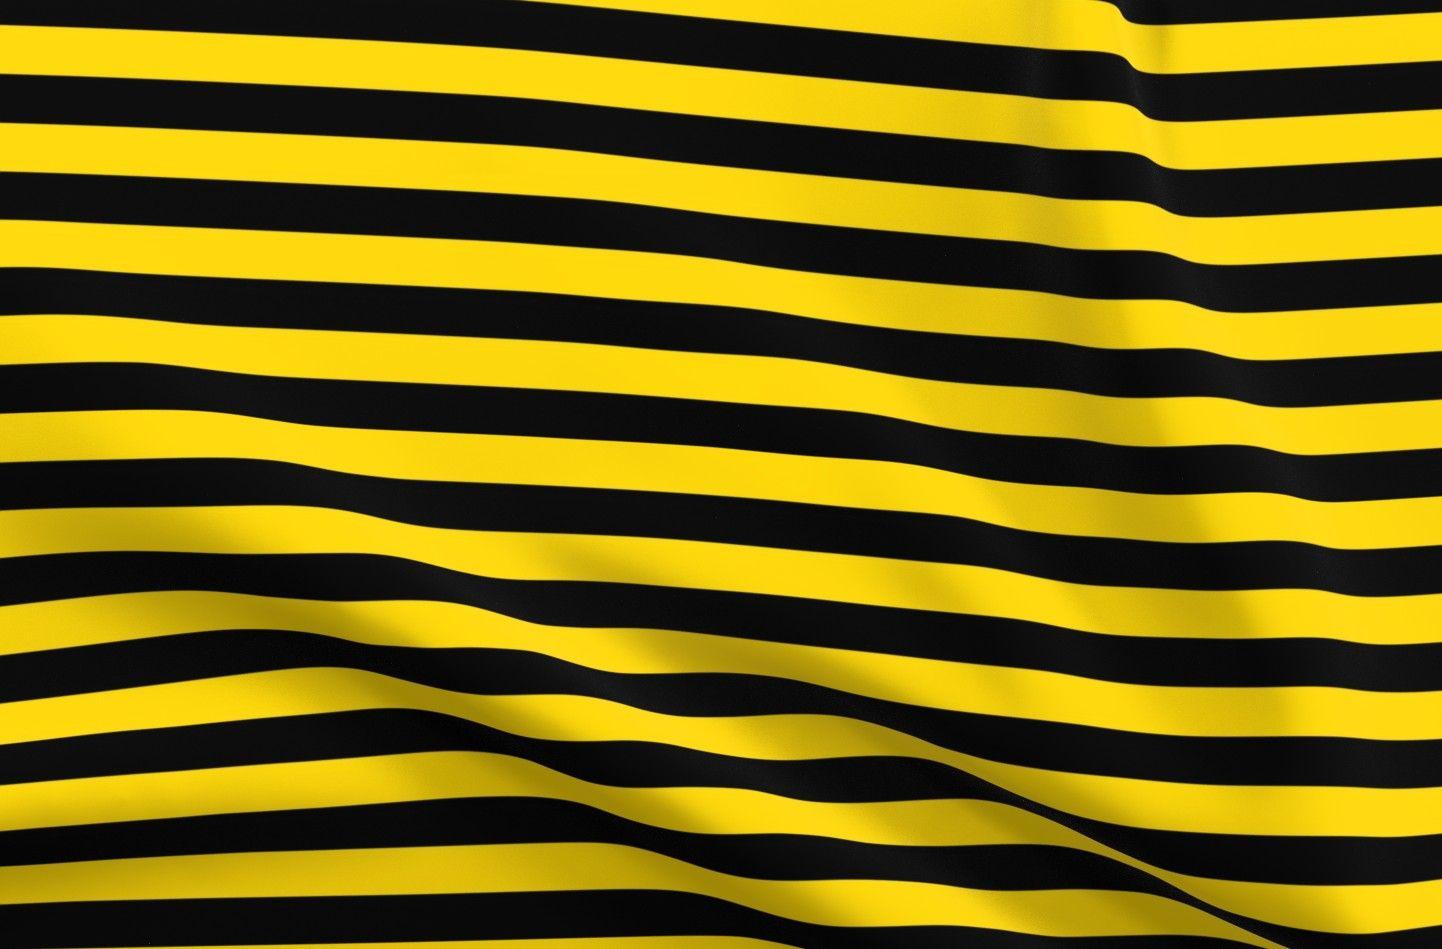 Fat Quarter Geometric Yellow and Black